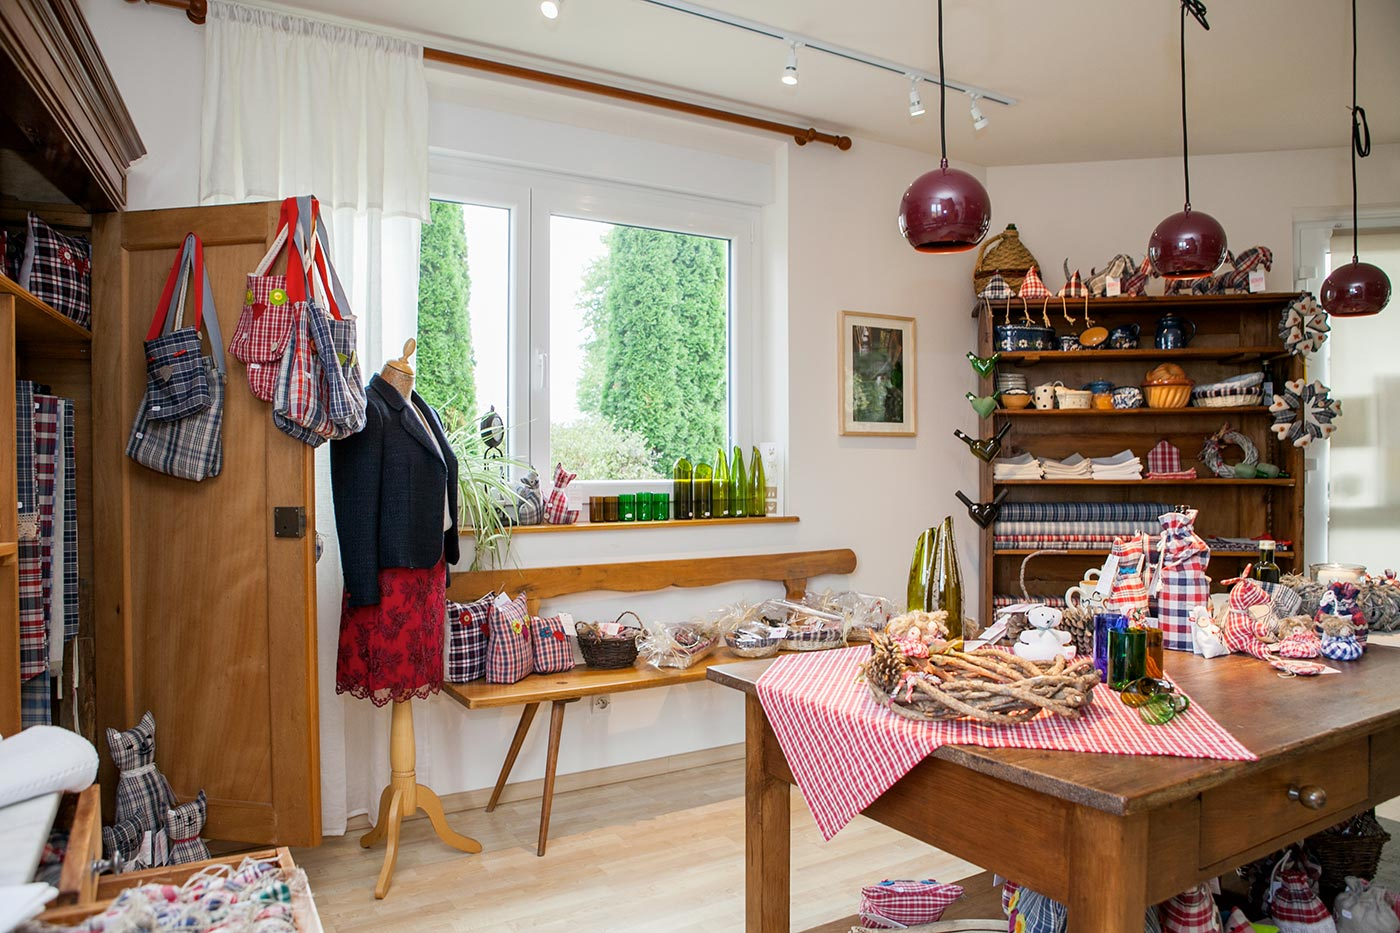 visiter-atelier-kelsch-alsace-in-seebach.jpg